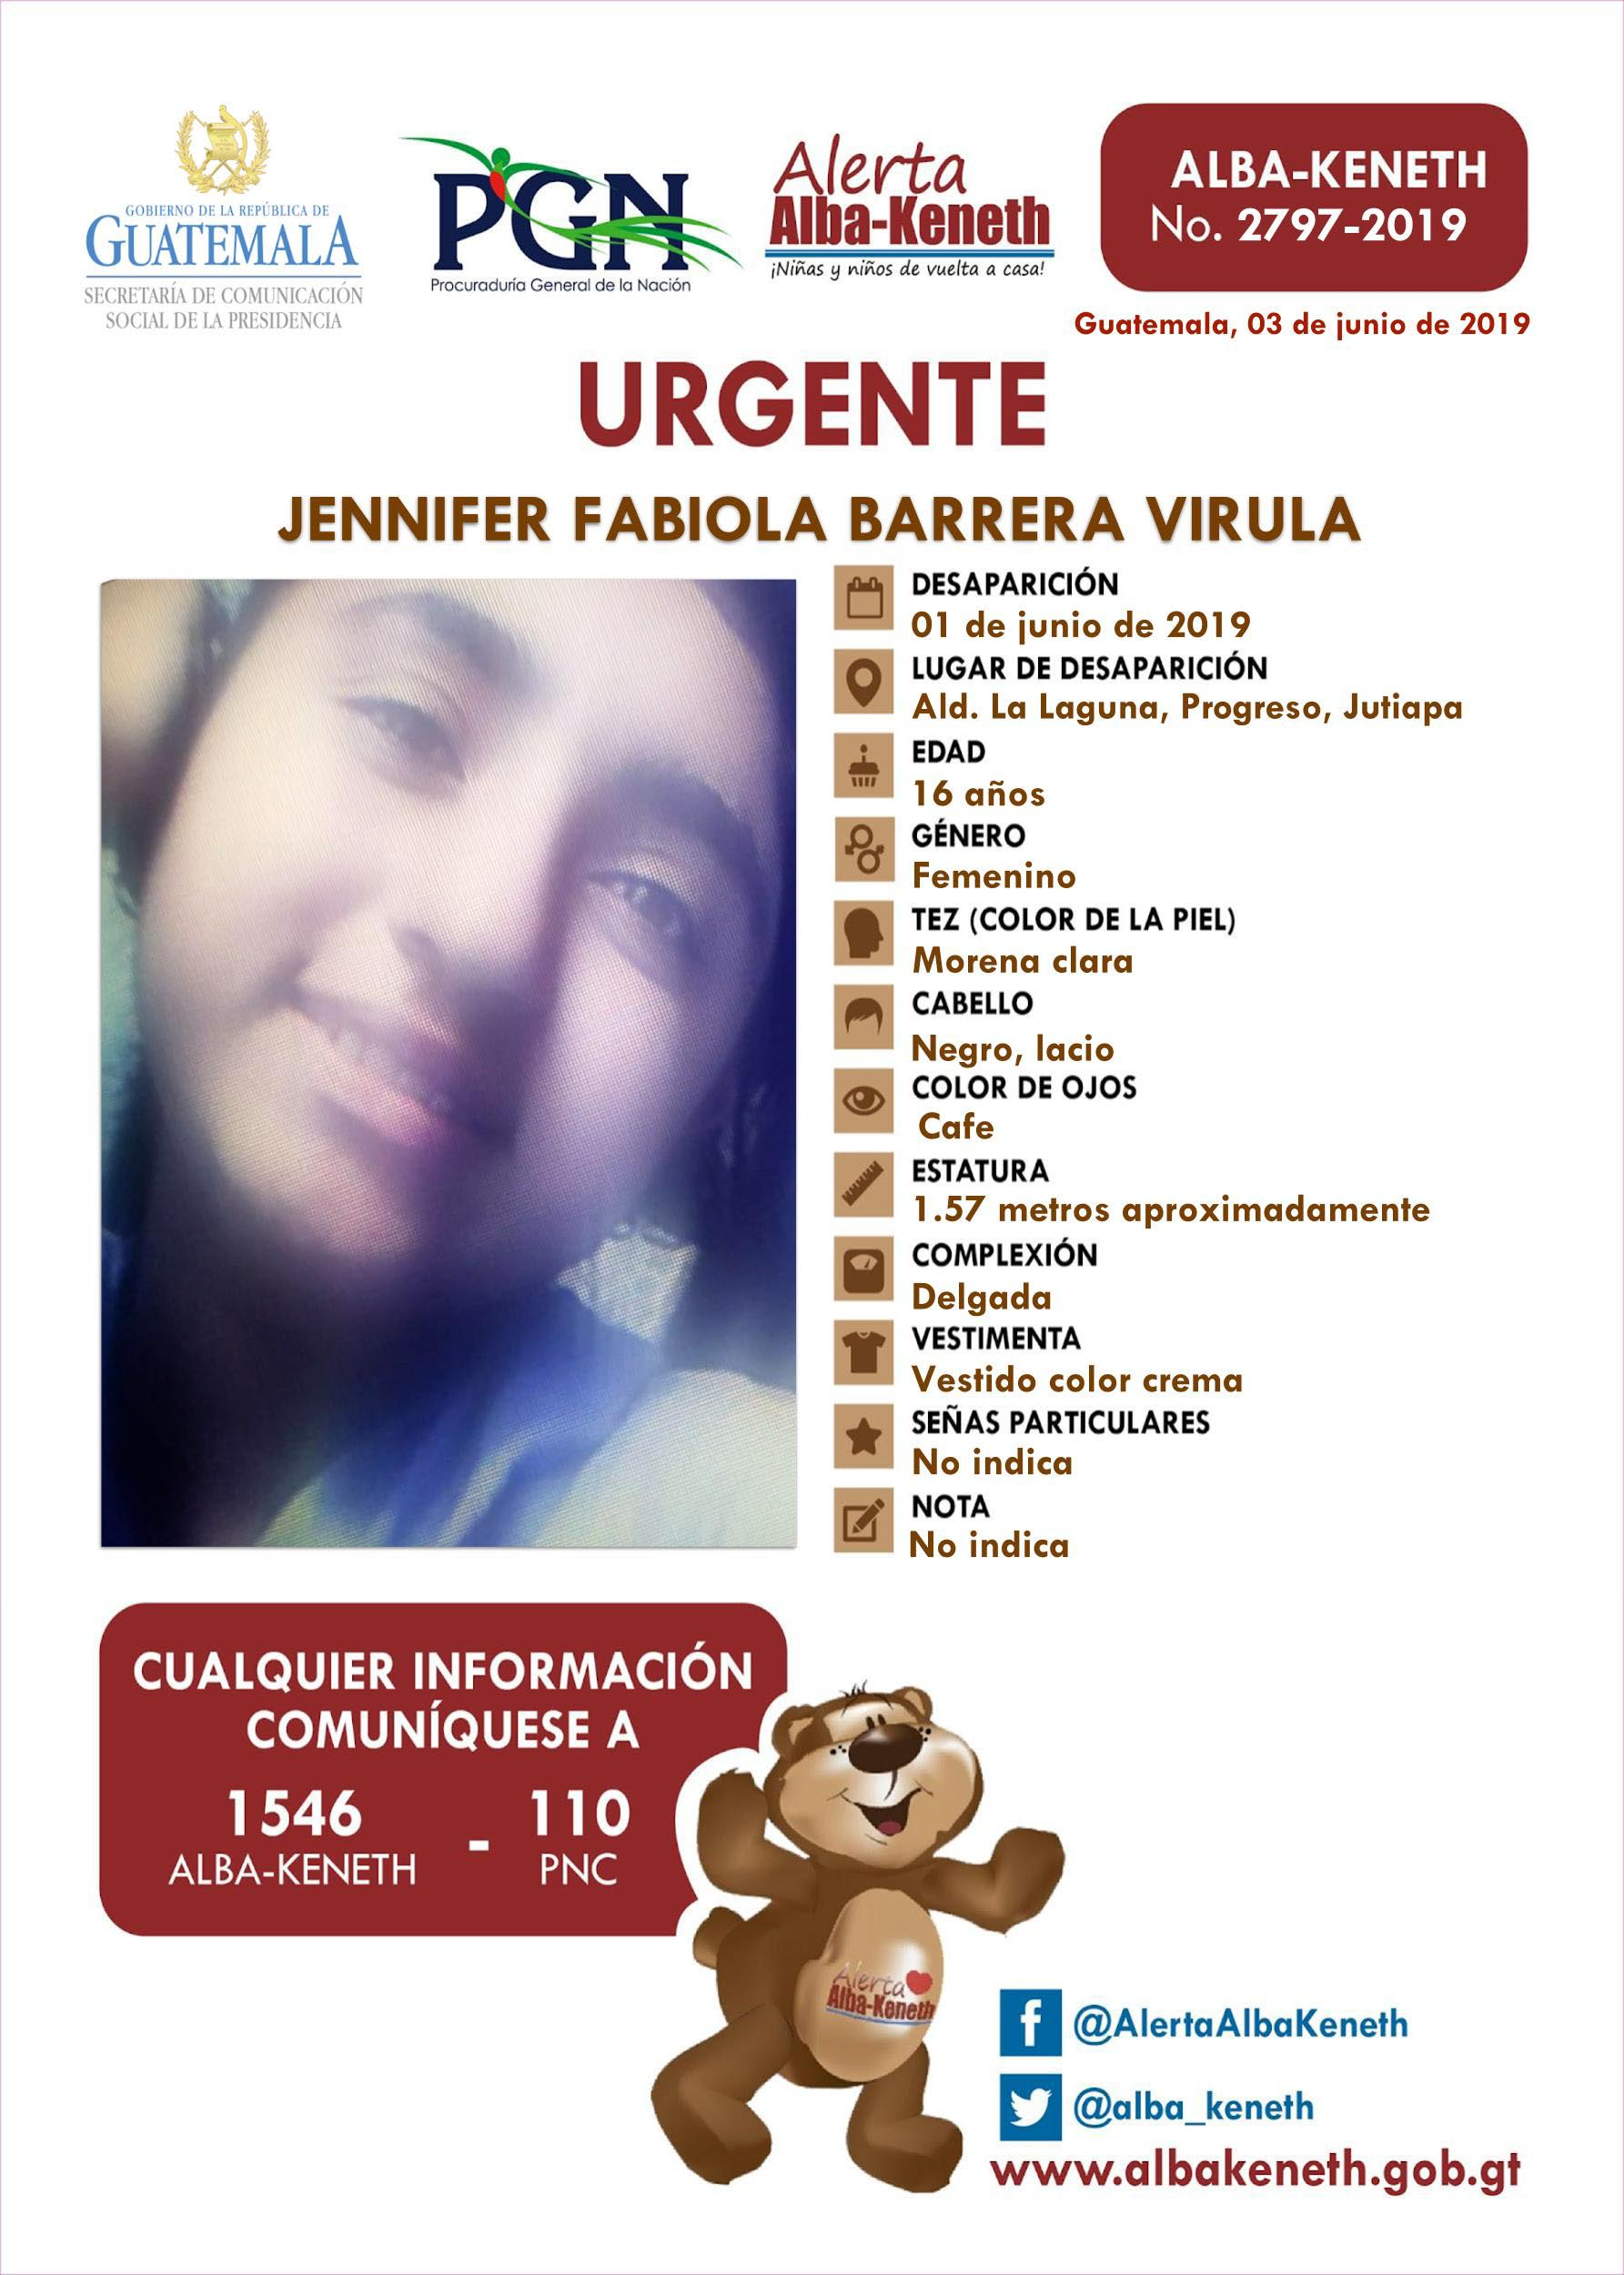 Jennifer Fabiola Barrera Virula